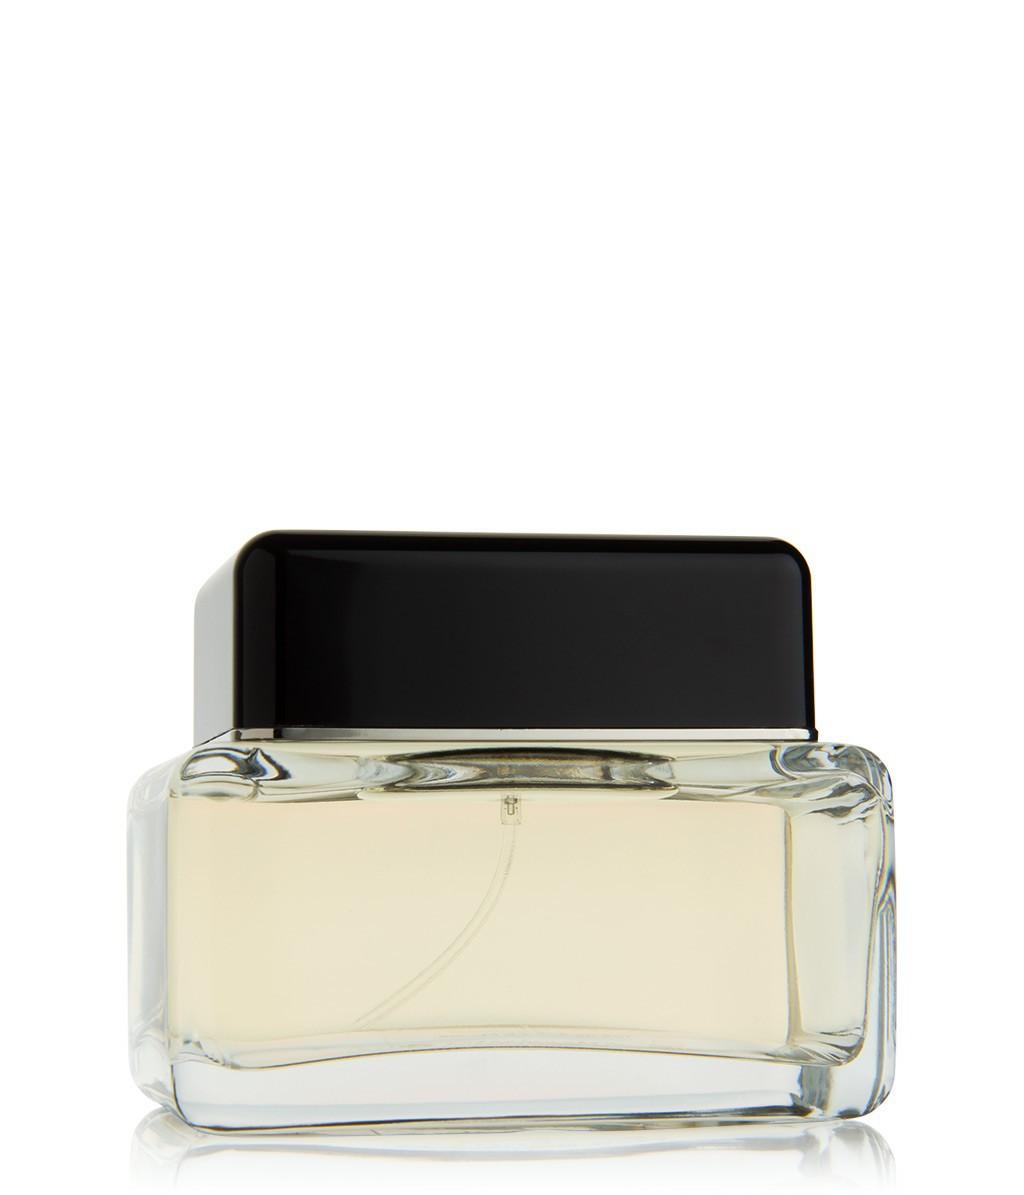 Marc Jacobs Men аромат для мужчин